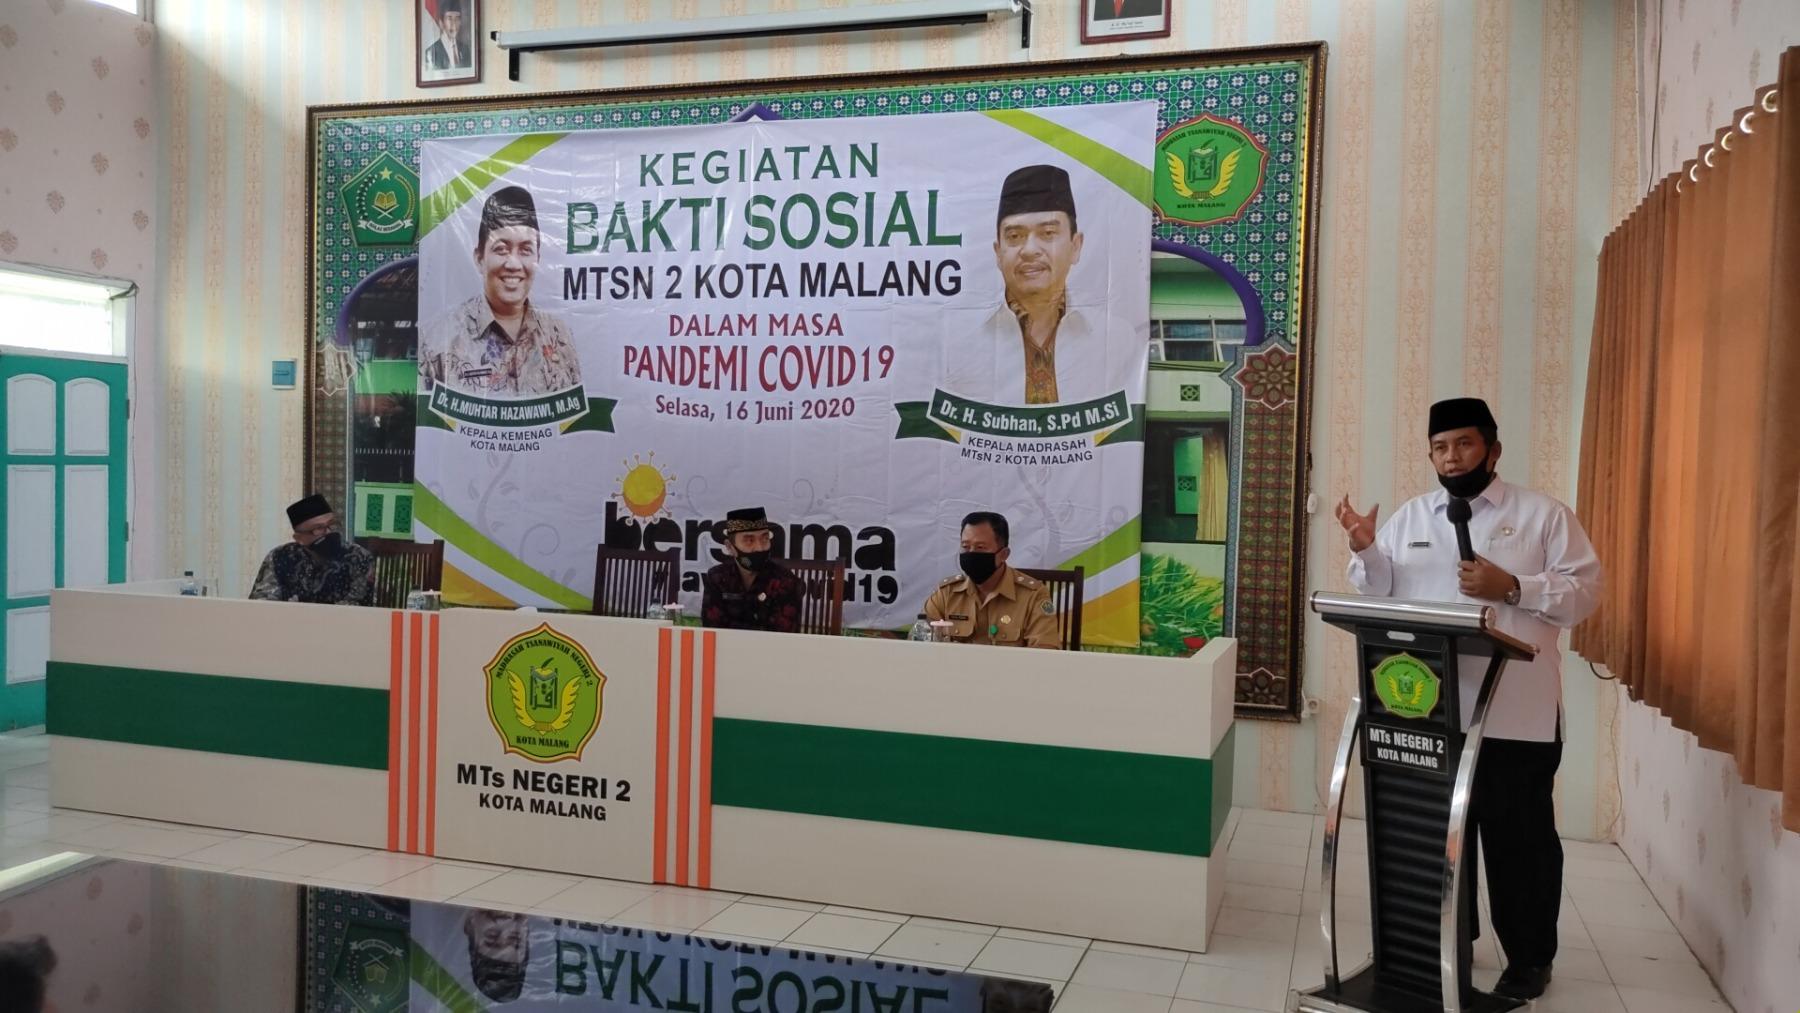 1.-Sambutan-Kepala-kantor-kementerian-agama-Dr.-H.-Muhtar-Hazawawi-M.Ag-Dalam-Acara-Bakti-Sosial-di-MTsN-2-Kota-Malang